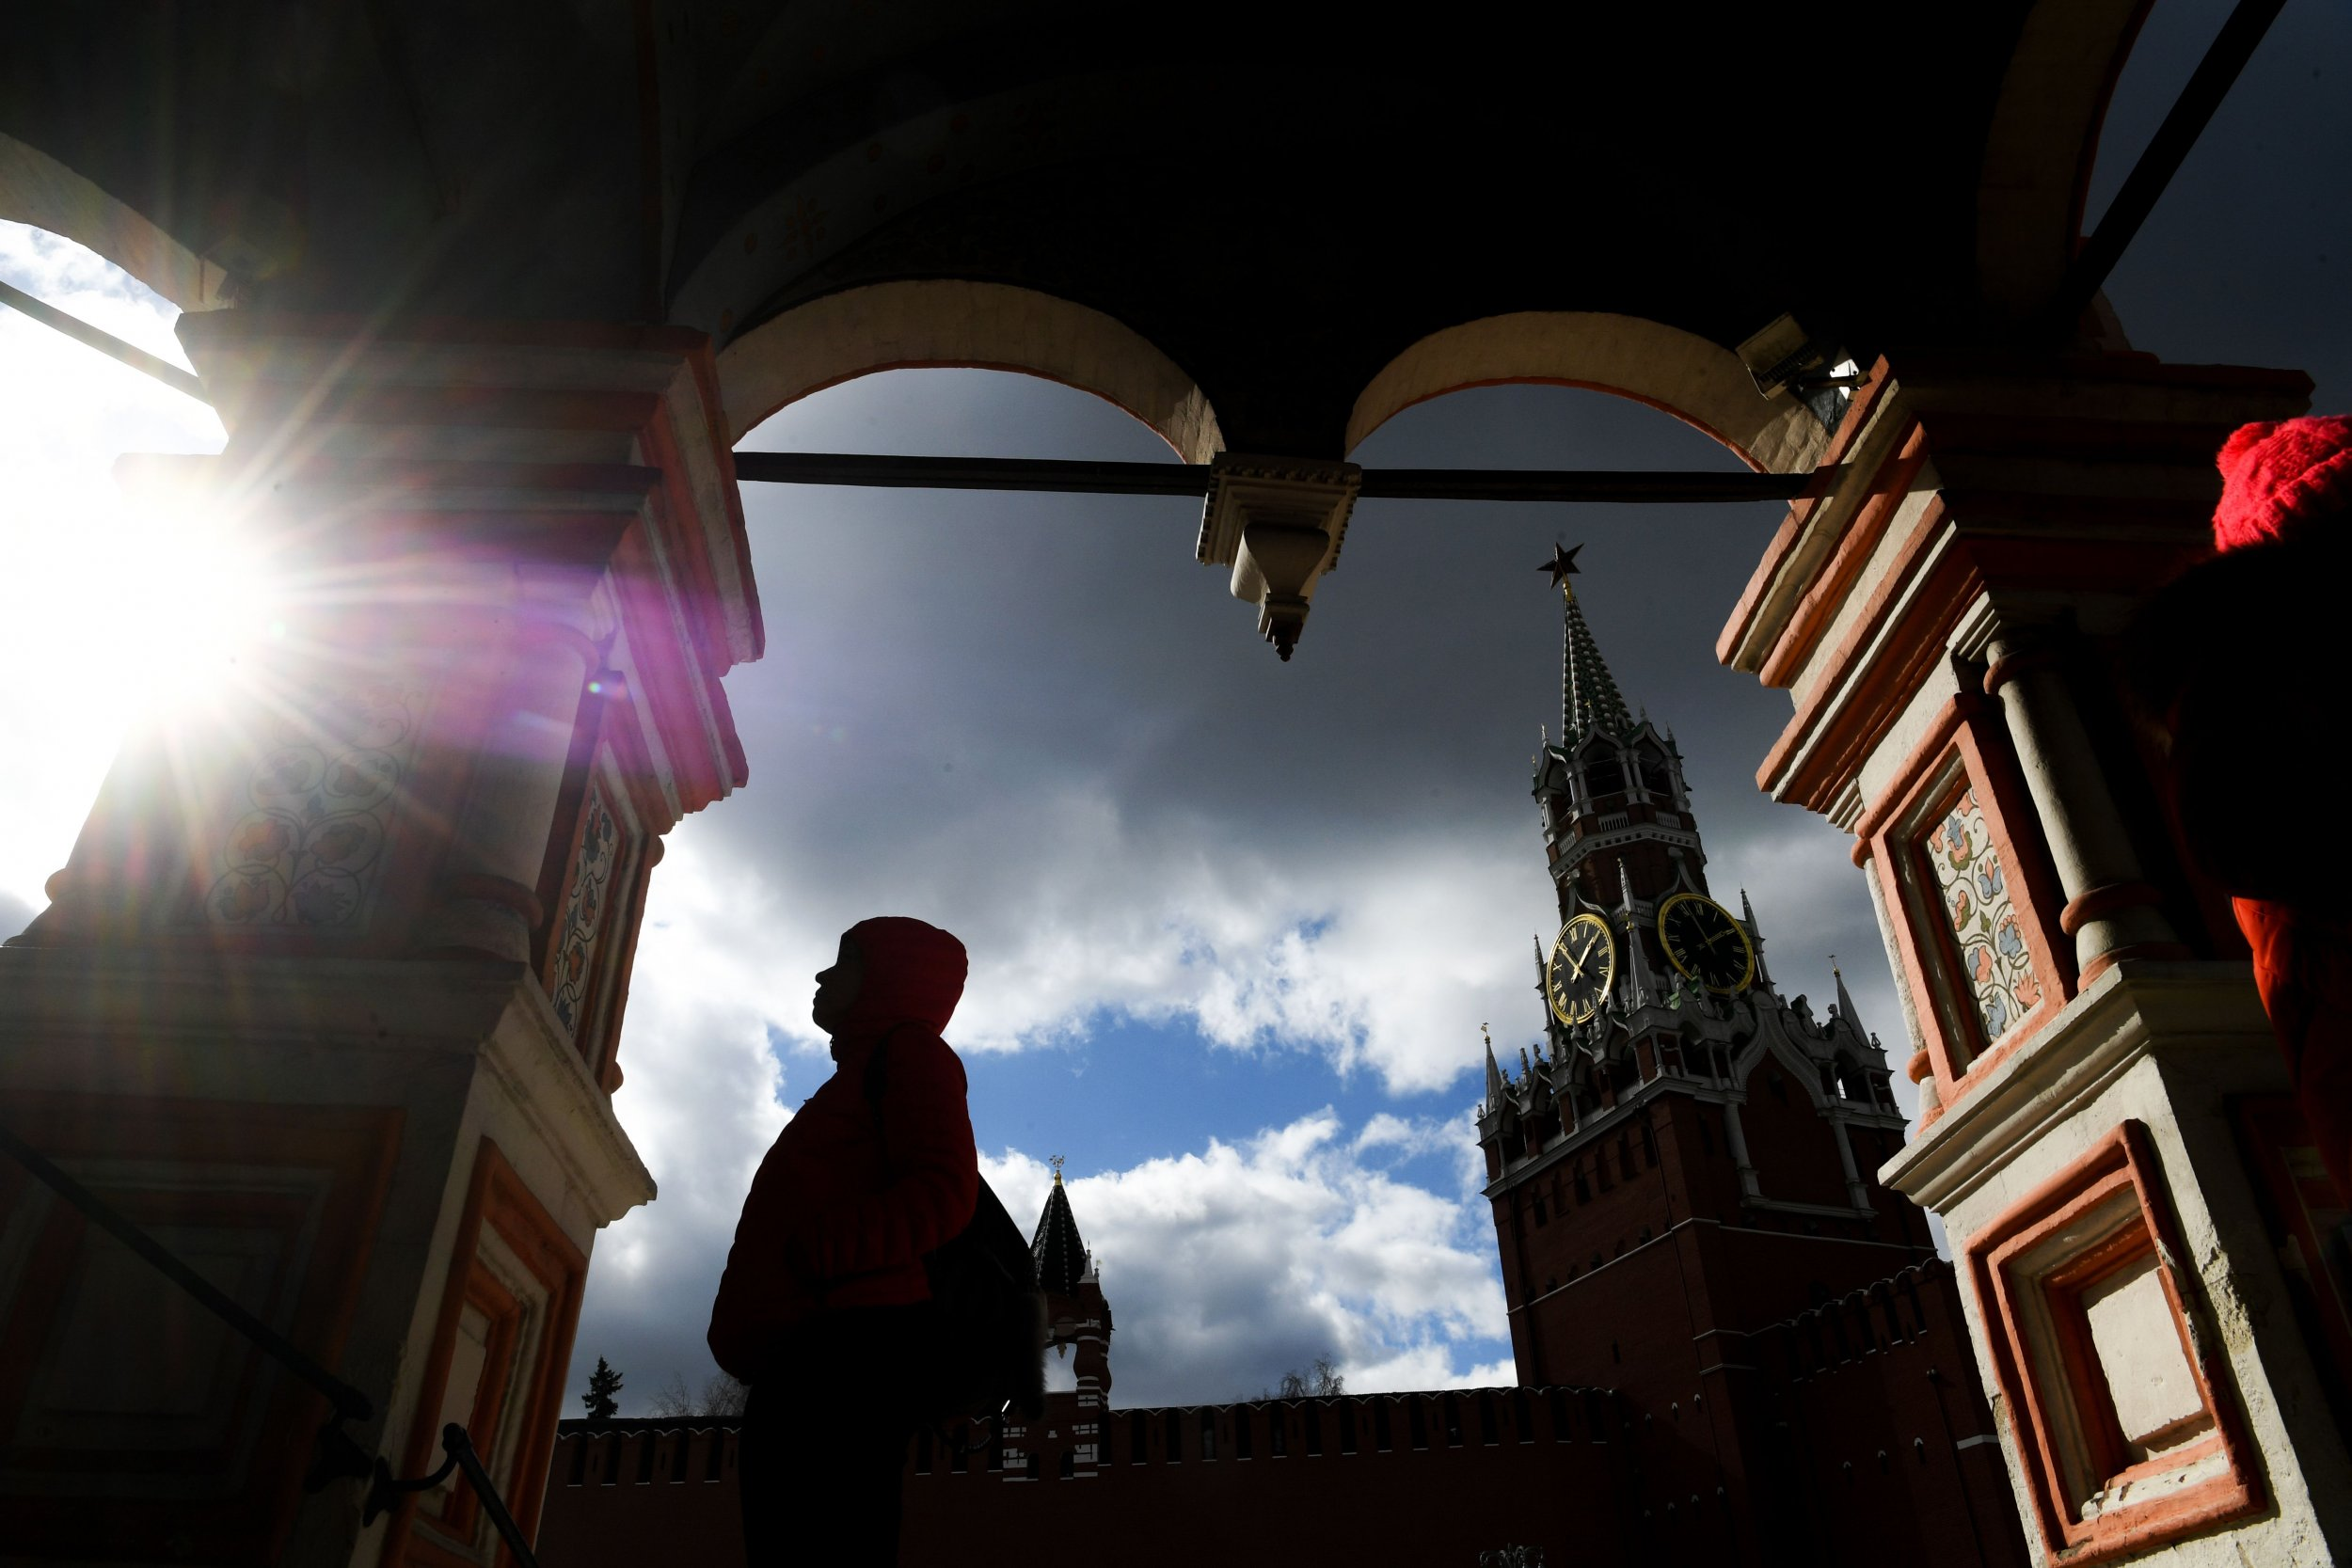 Moscow Russia dysentery Yevgeniy Prigozhin